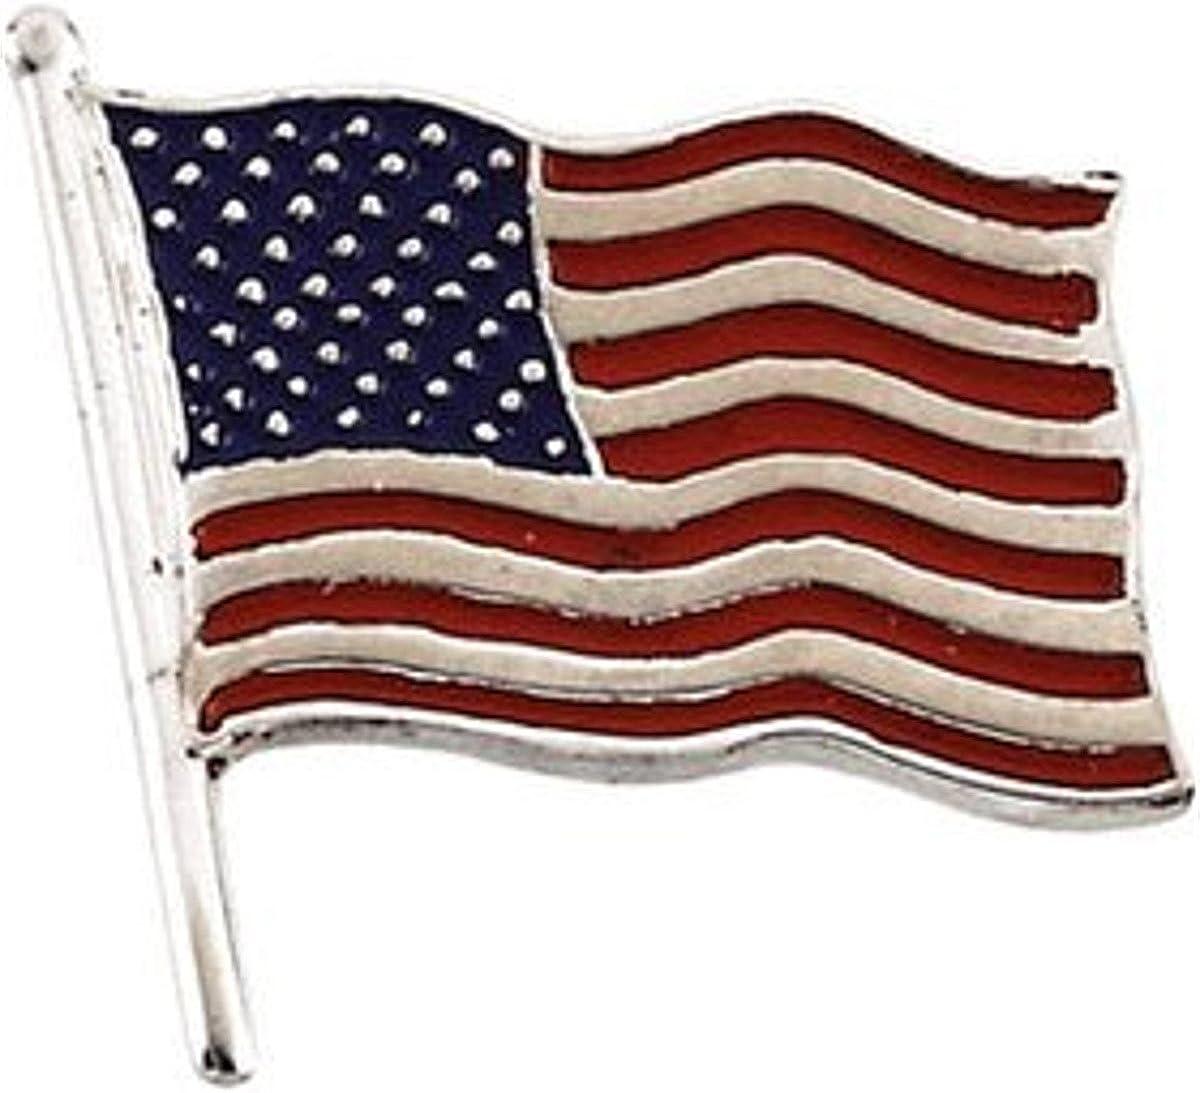 Americas /& Americas USA Flag Lapel Pin .925 Sterling Silver Large